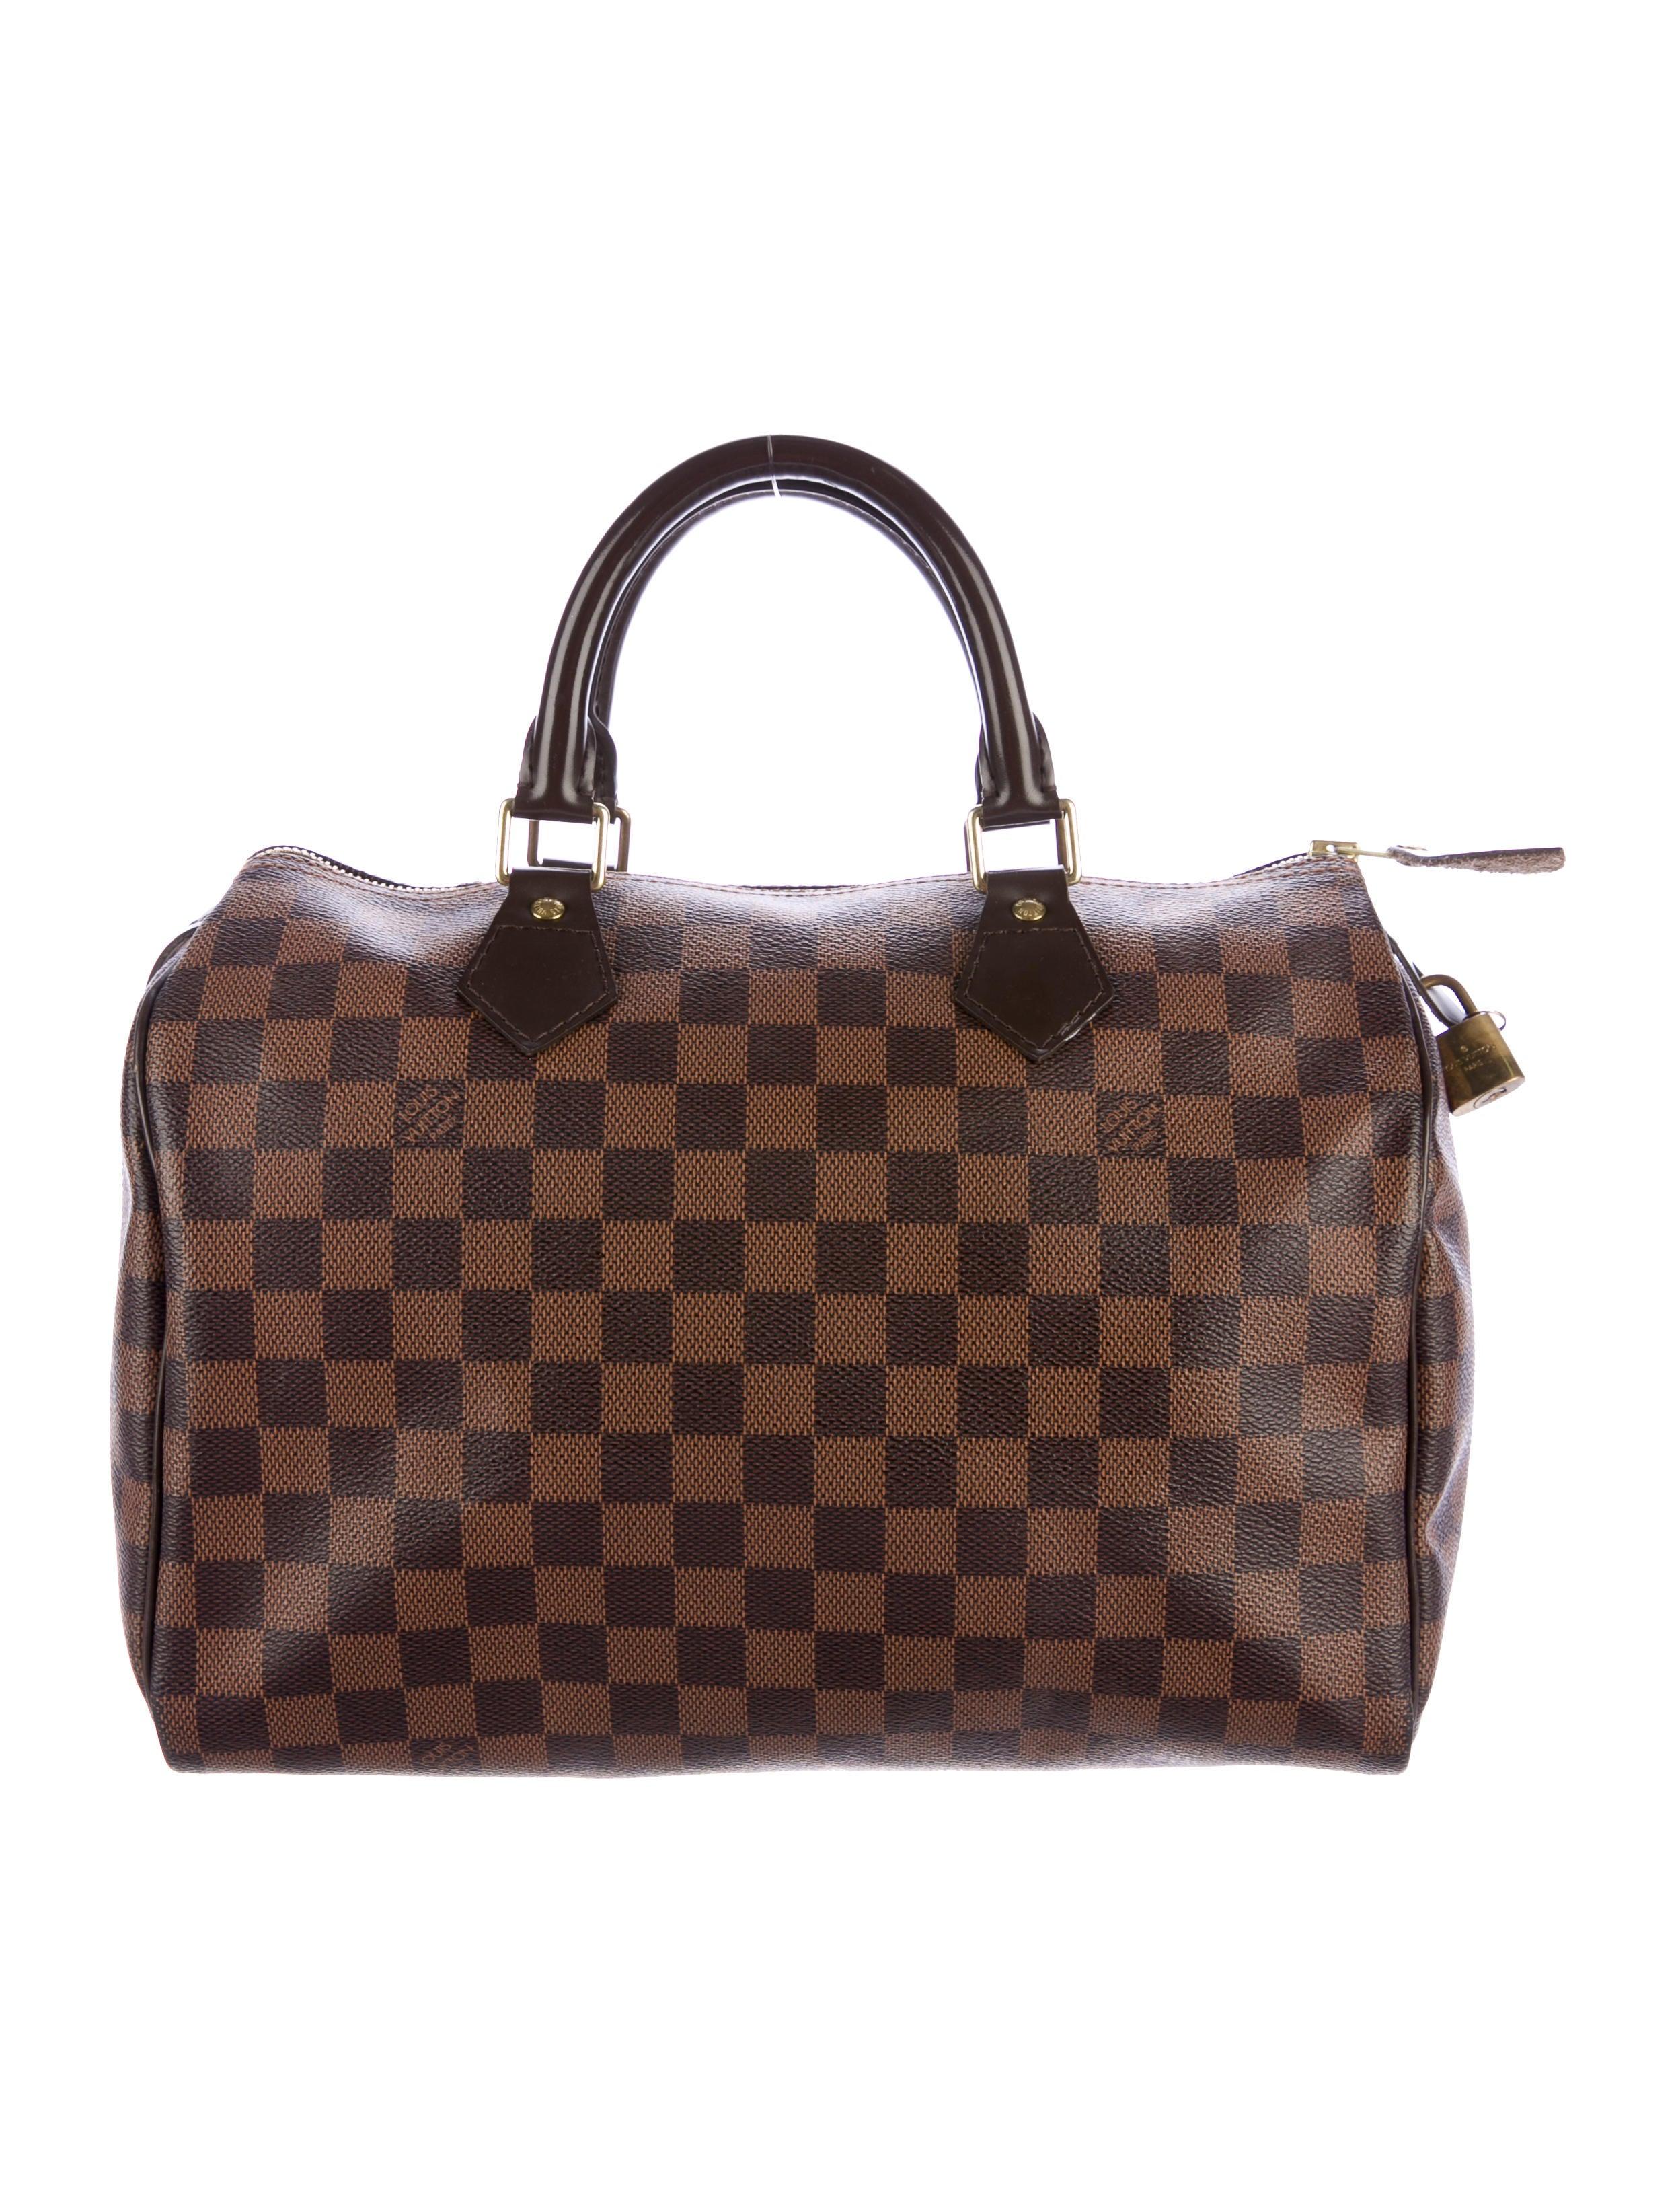 louis vuitton damier speedy 30 handbags lou126752. Black Bedroom Furniture Sets. Home Design Ideas